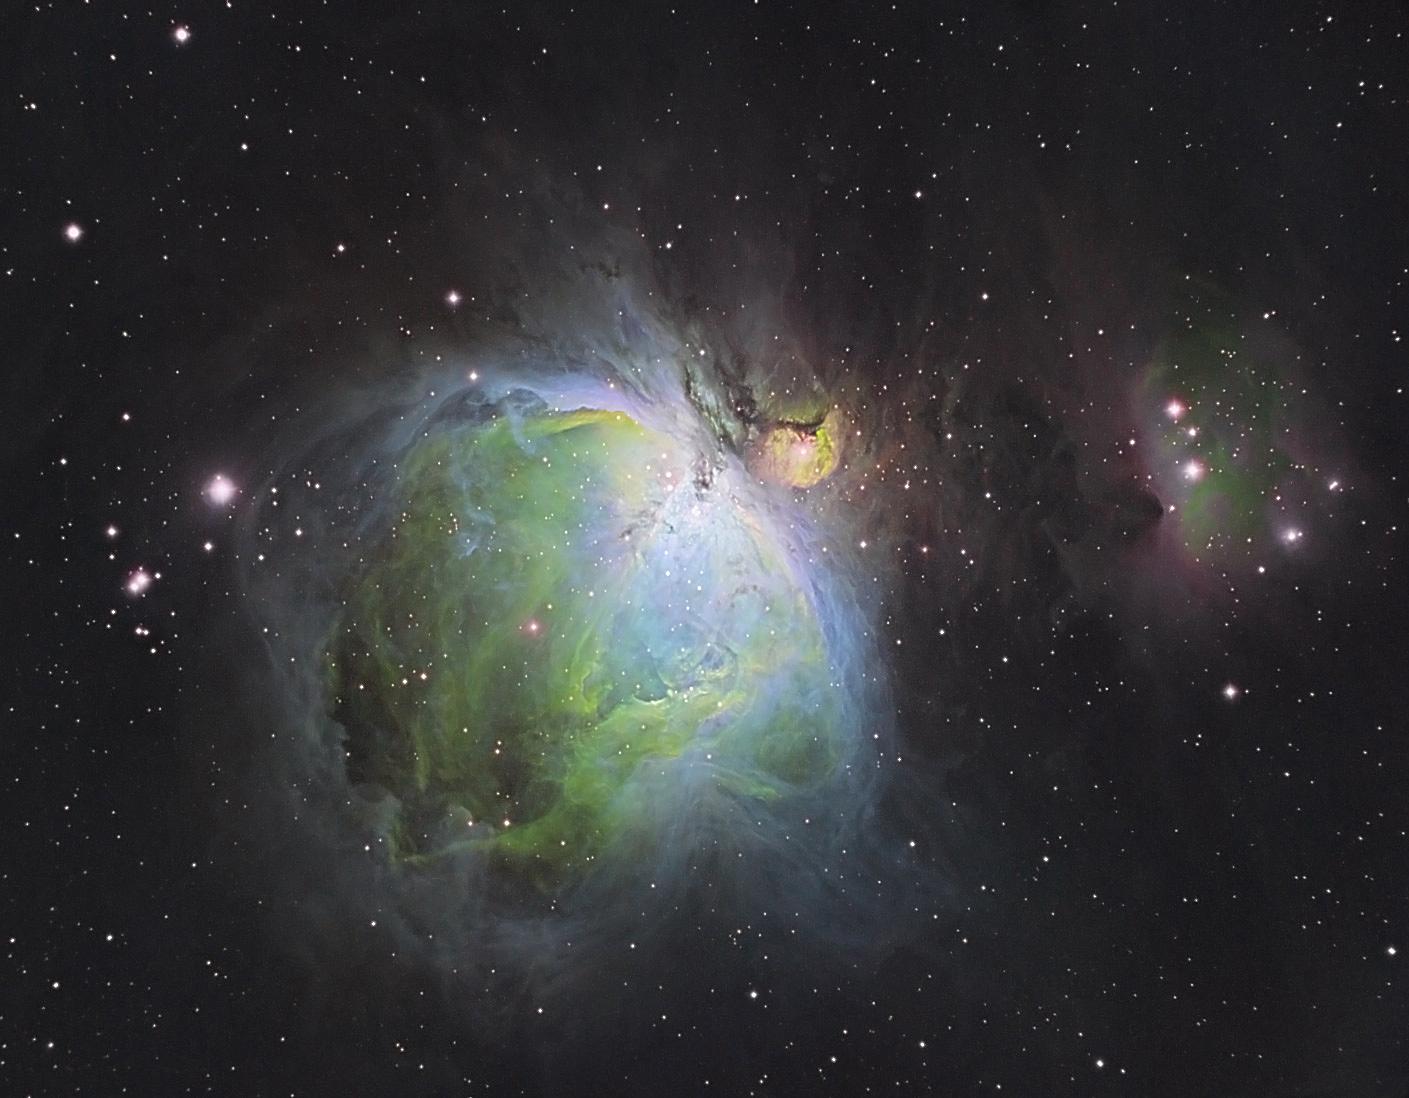 Orion Nebula in false color